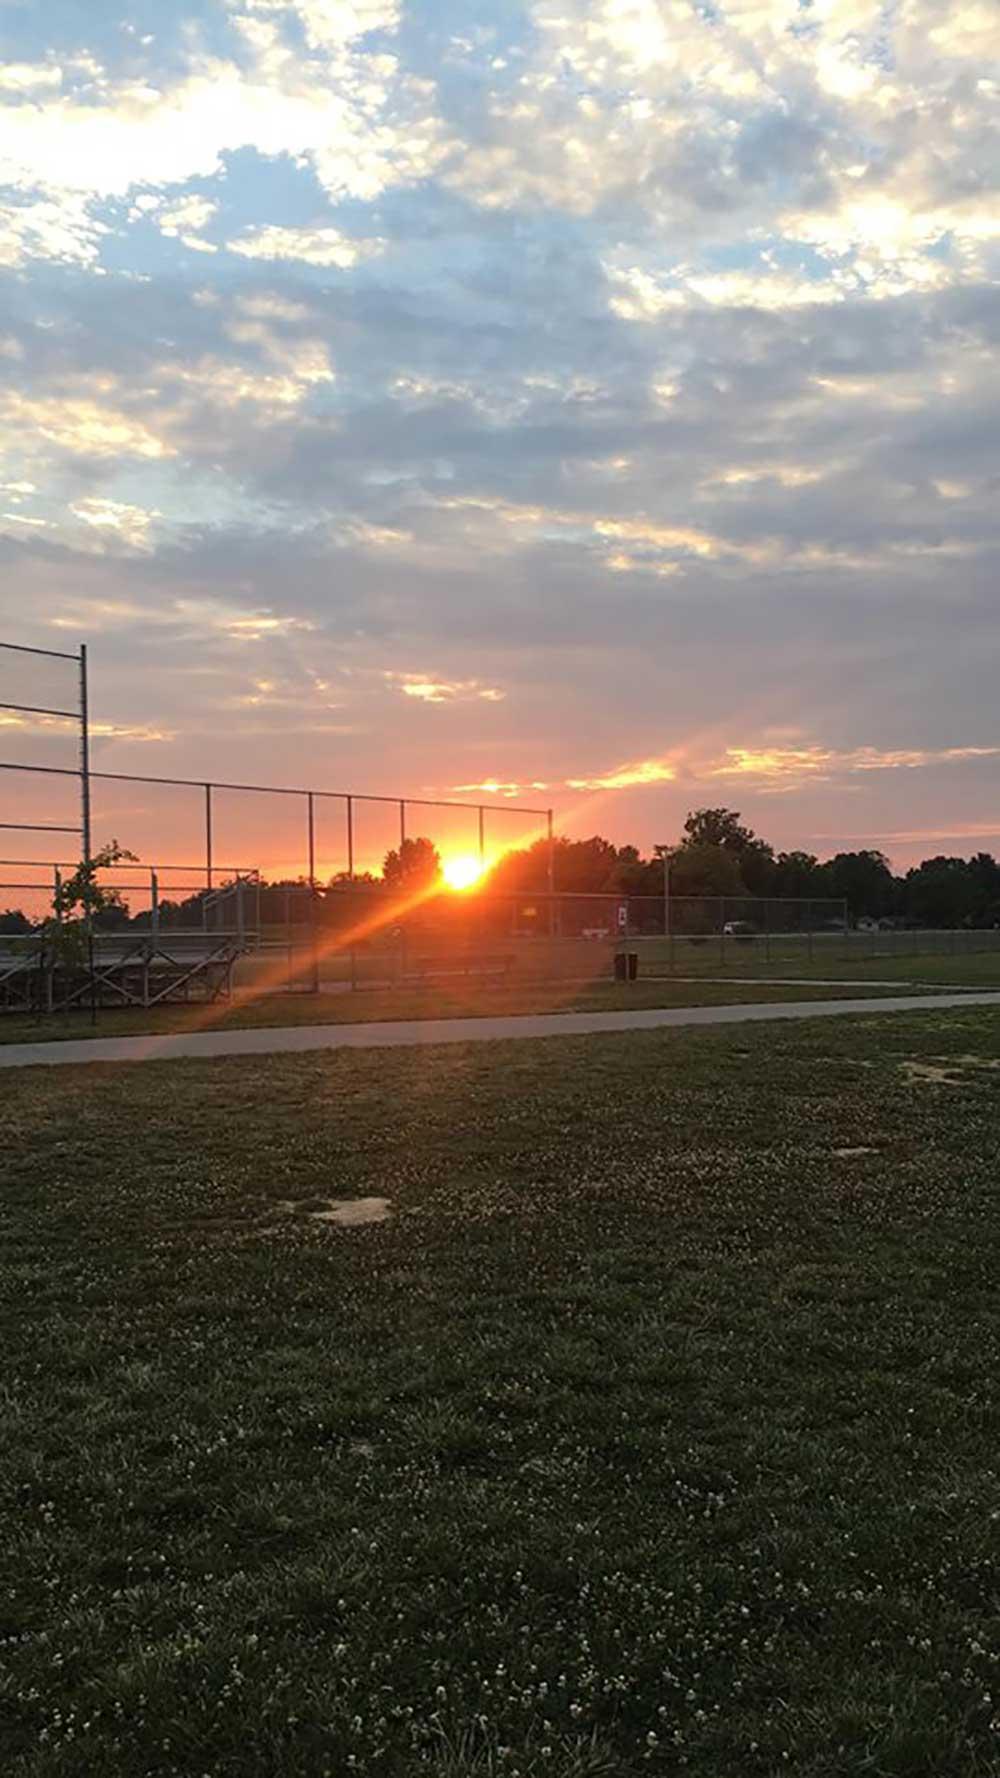 Sunset at Glazebrook Park